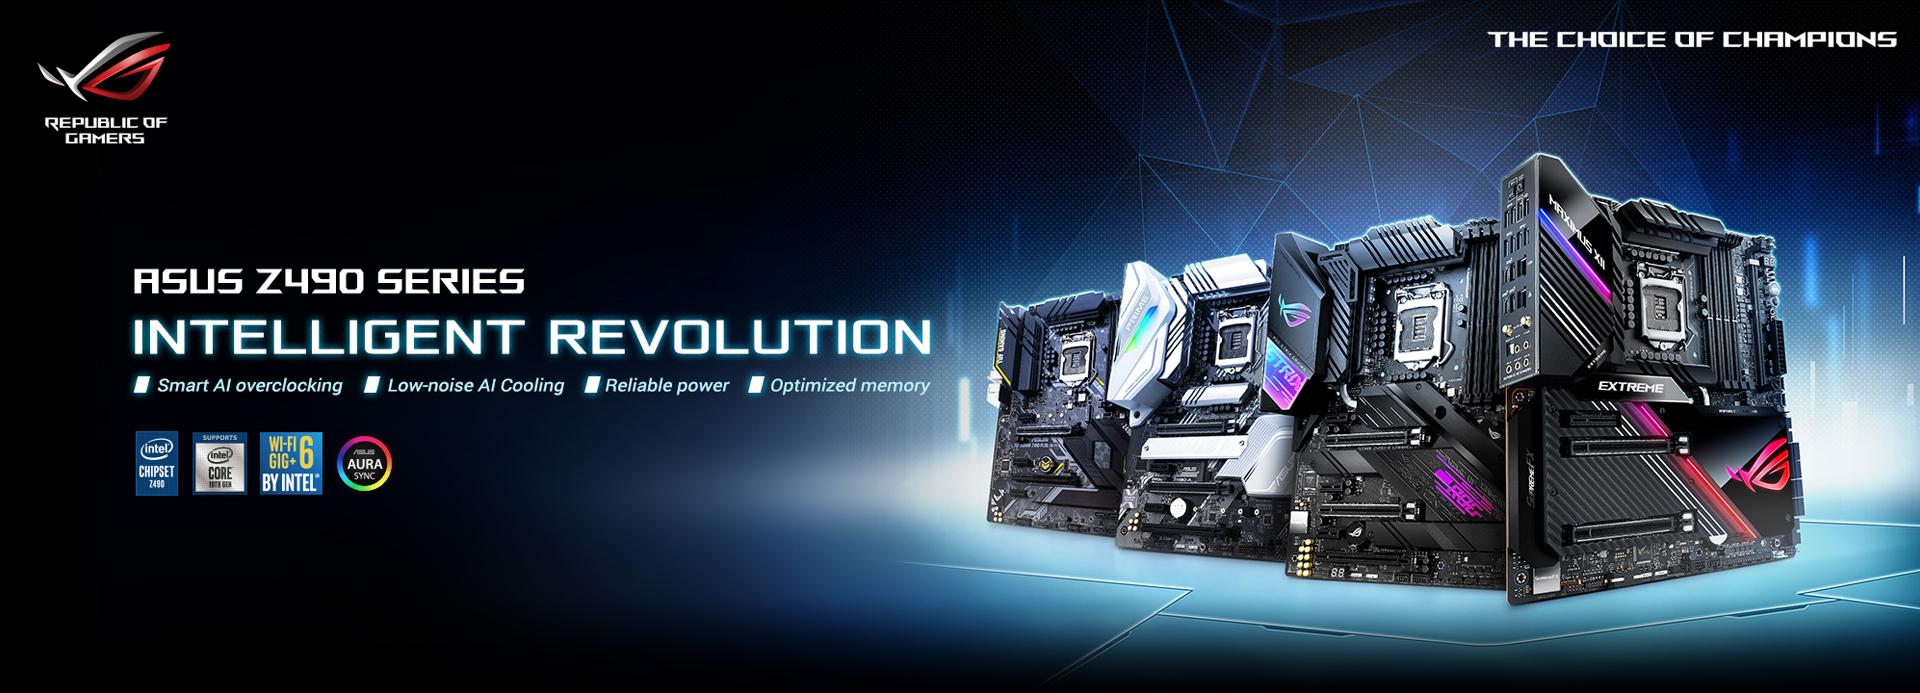 ASUS Z490 Intel CPU Motherboard